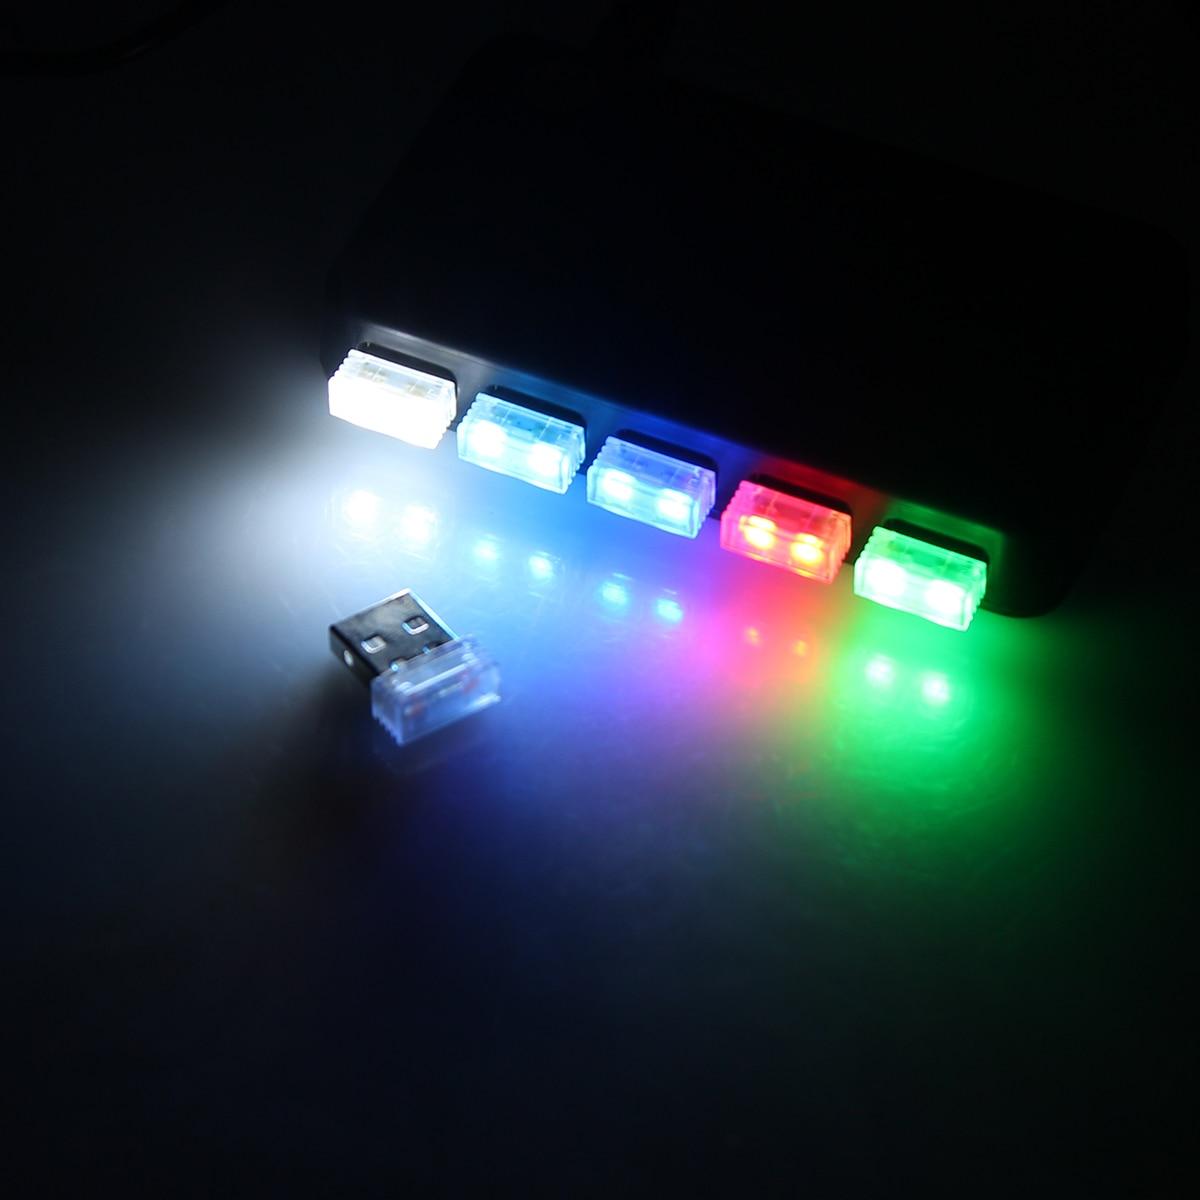 USB Mini LED Car Atmosphere Lights Cigarette Lighter Decorative Lights USB Led Light For Computer Car MP3 Player Red/Blue/White